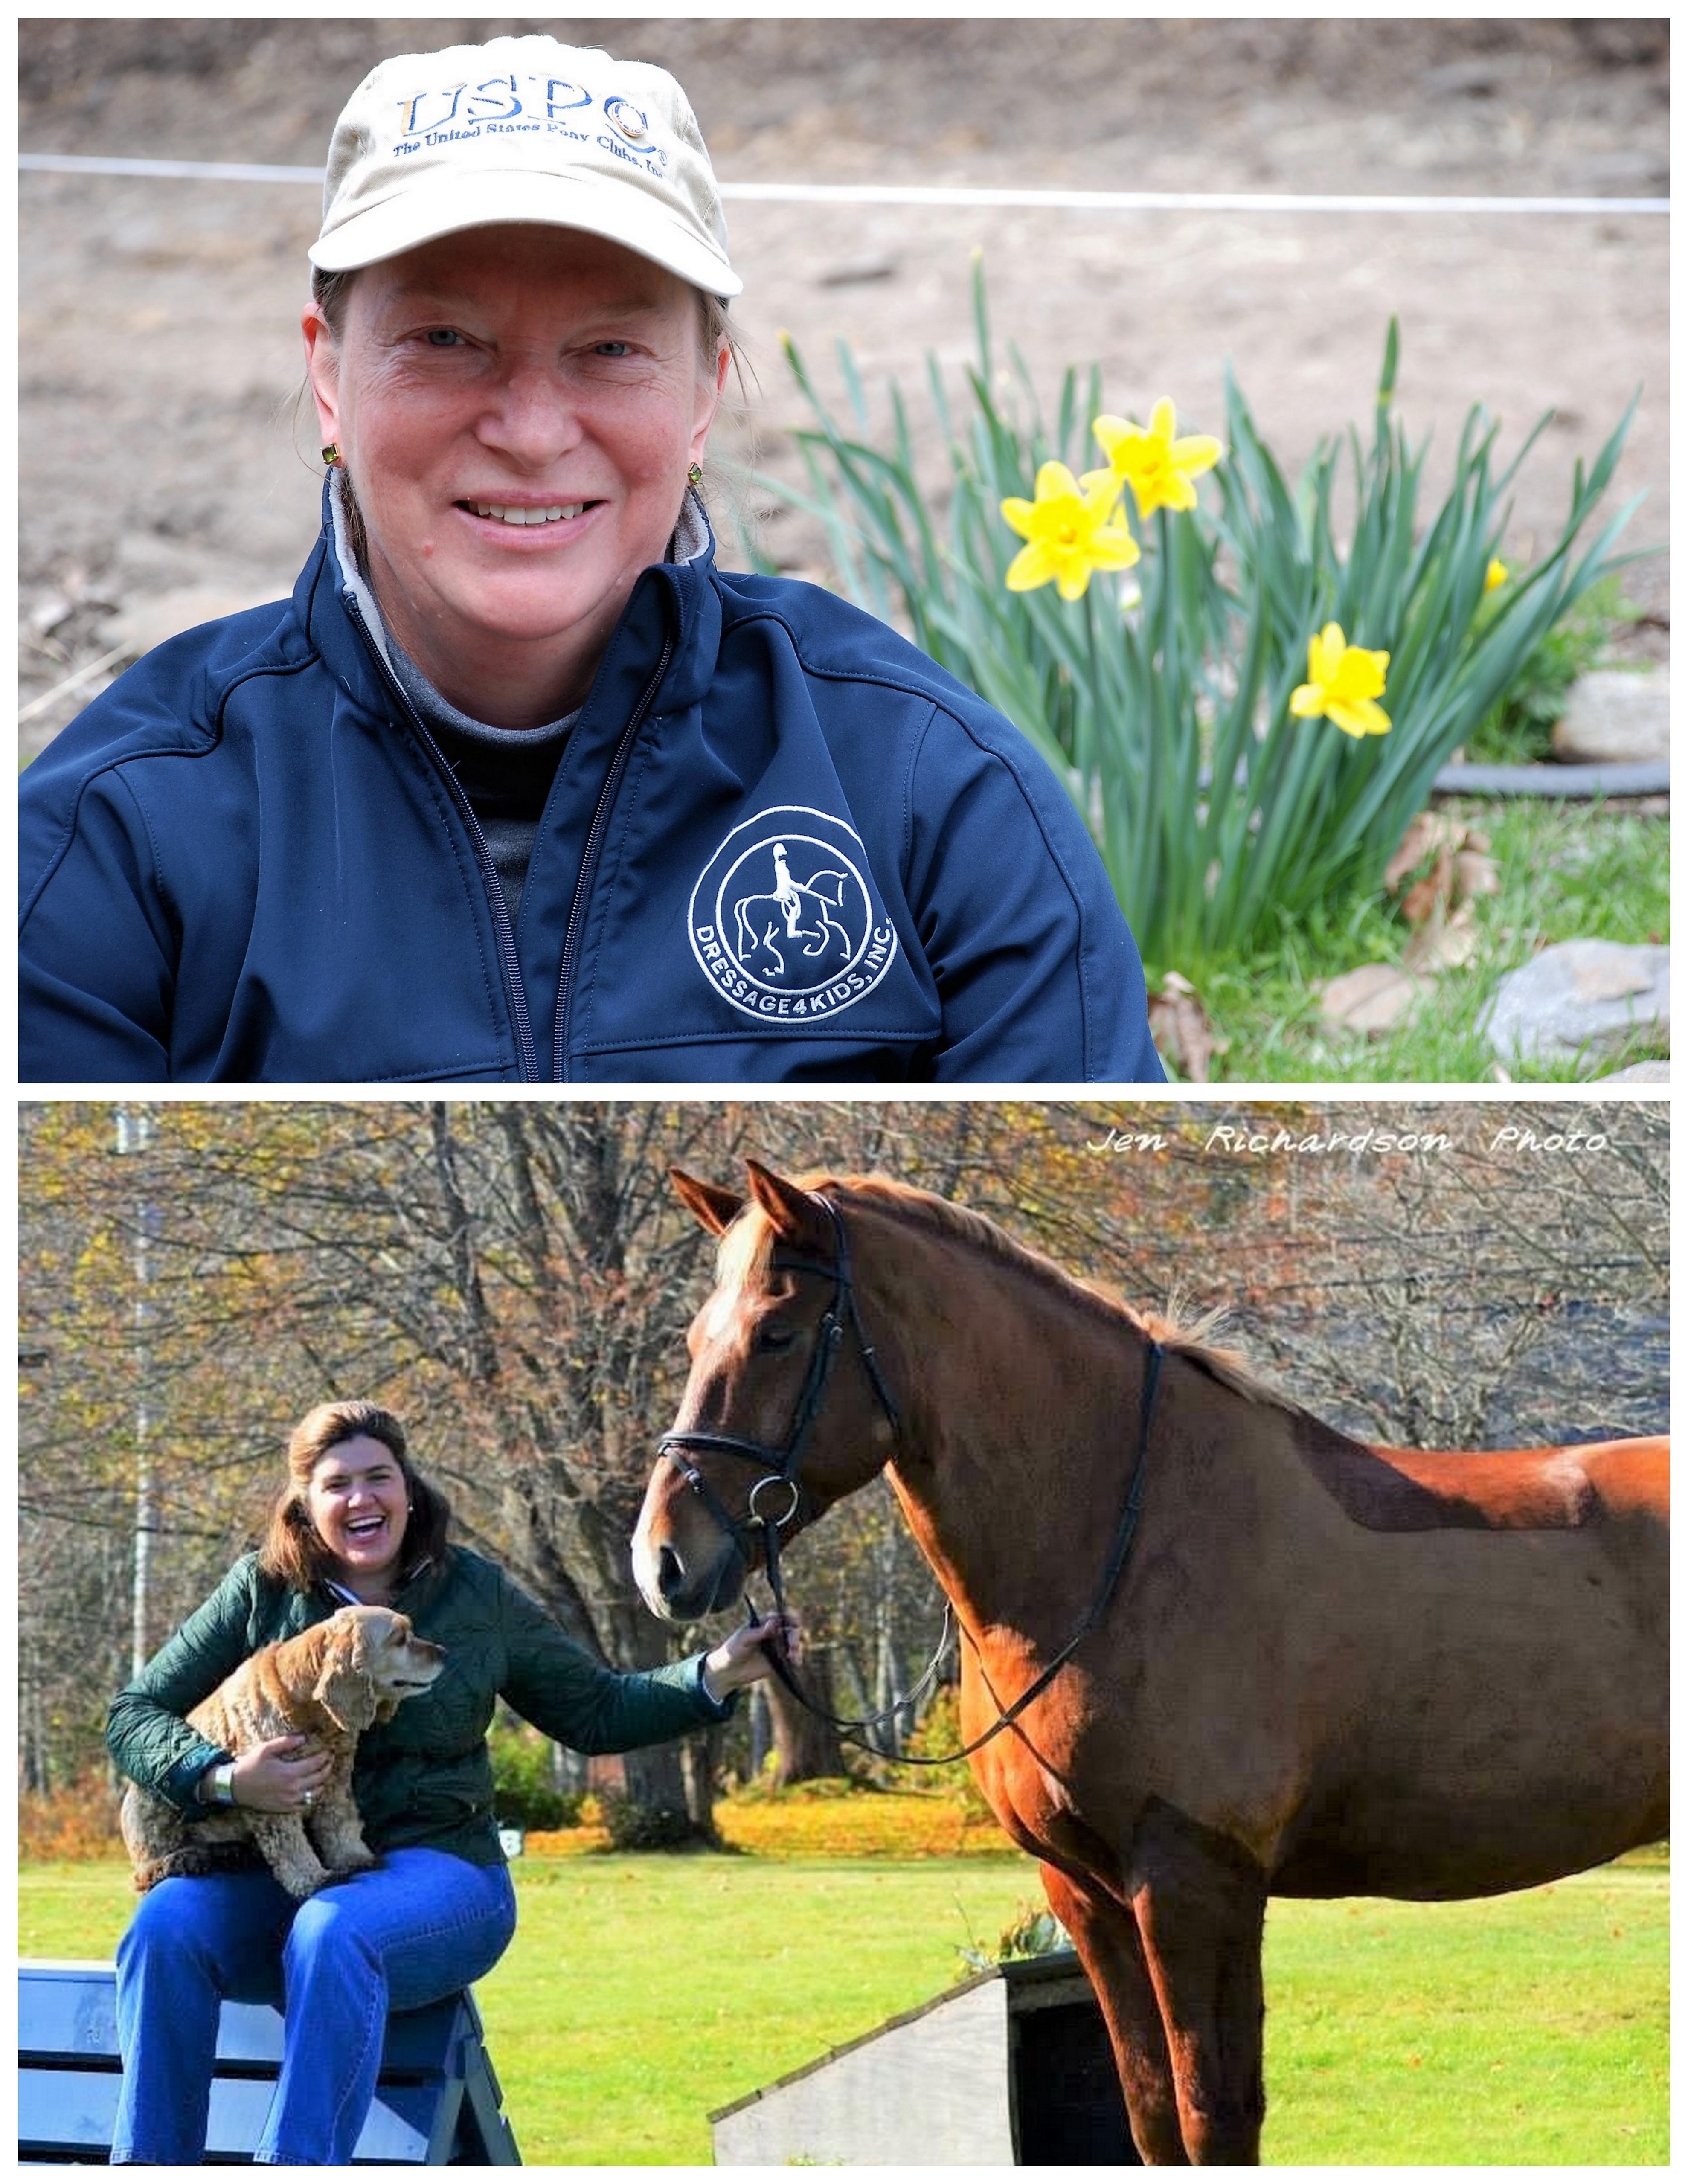 TDF Awards Two $500 Grants to Pony Club Members